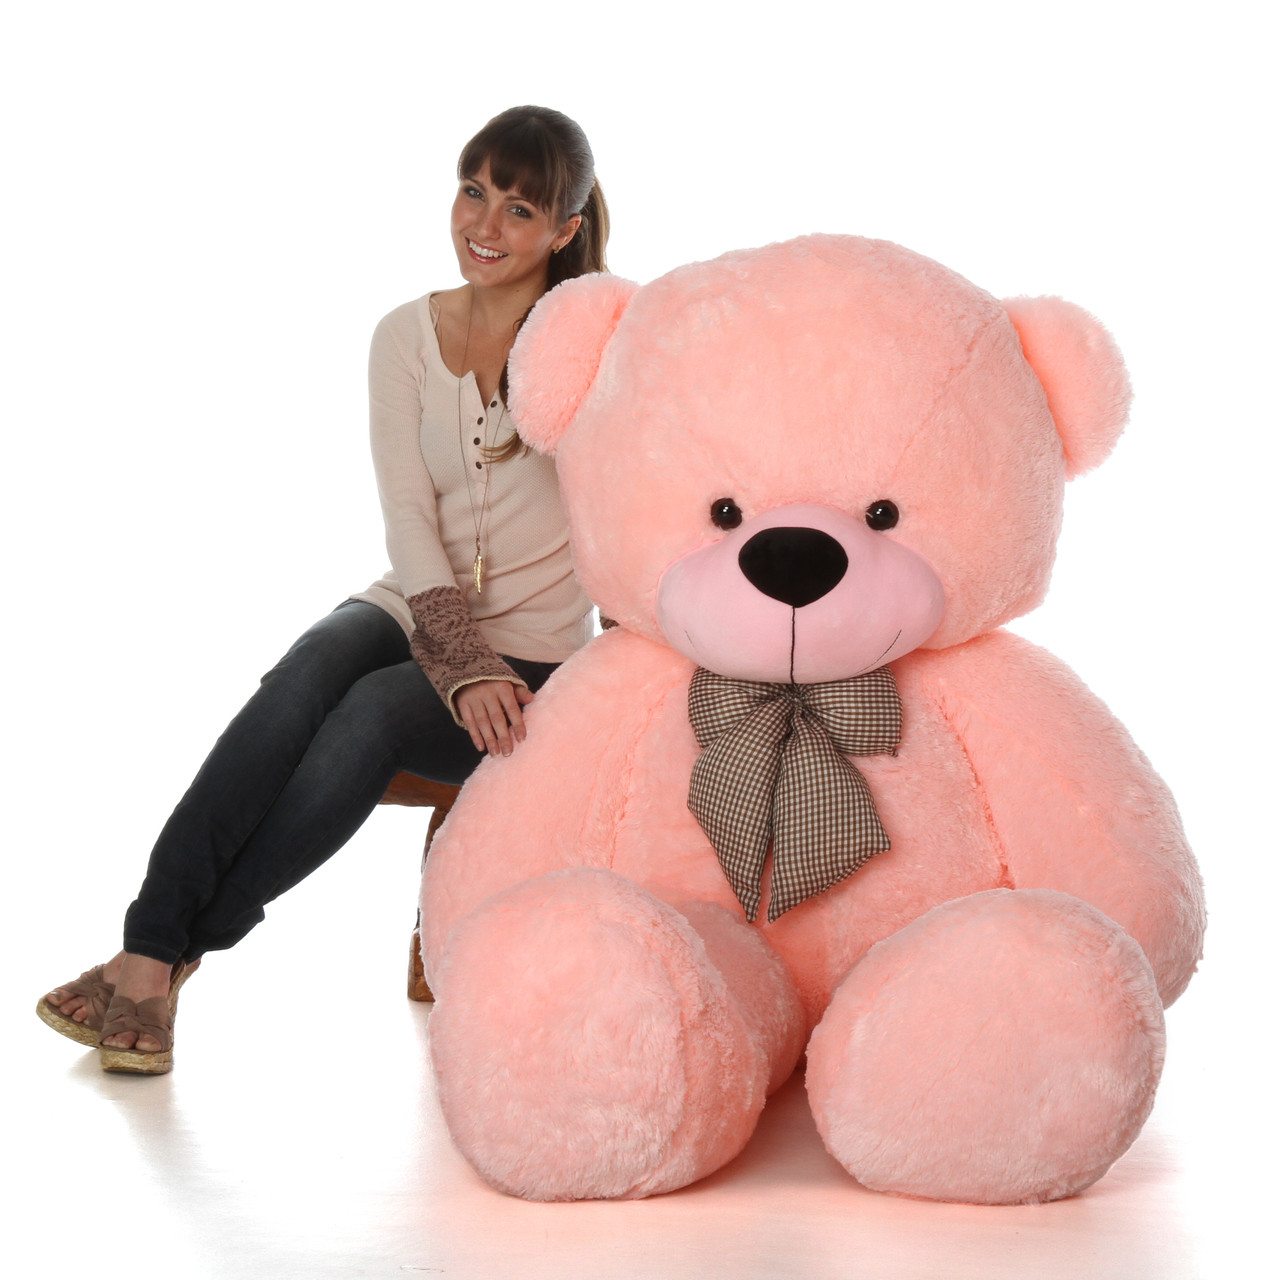 ae5f49ac622 6ft Giant Life Size Pink Teddy Bear Lady Cuddles